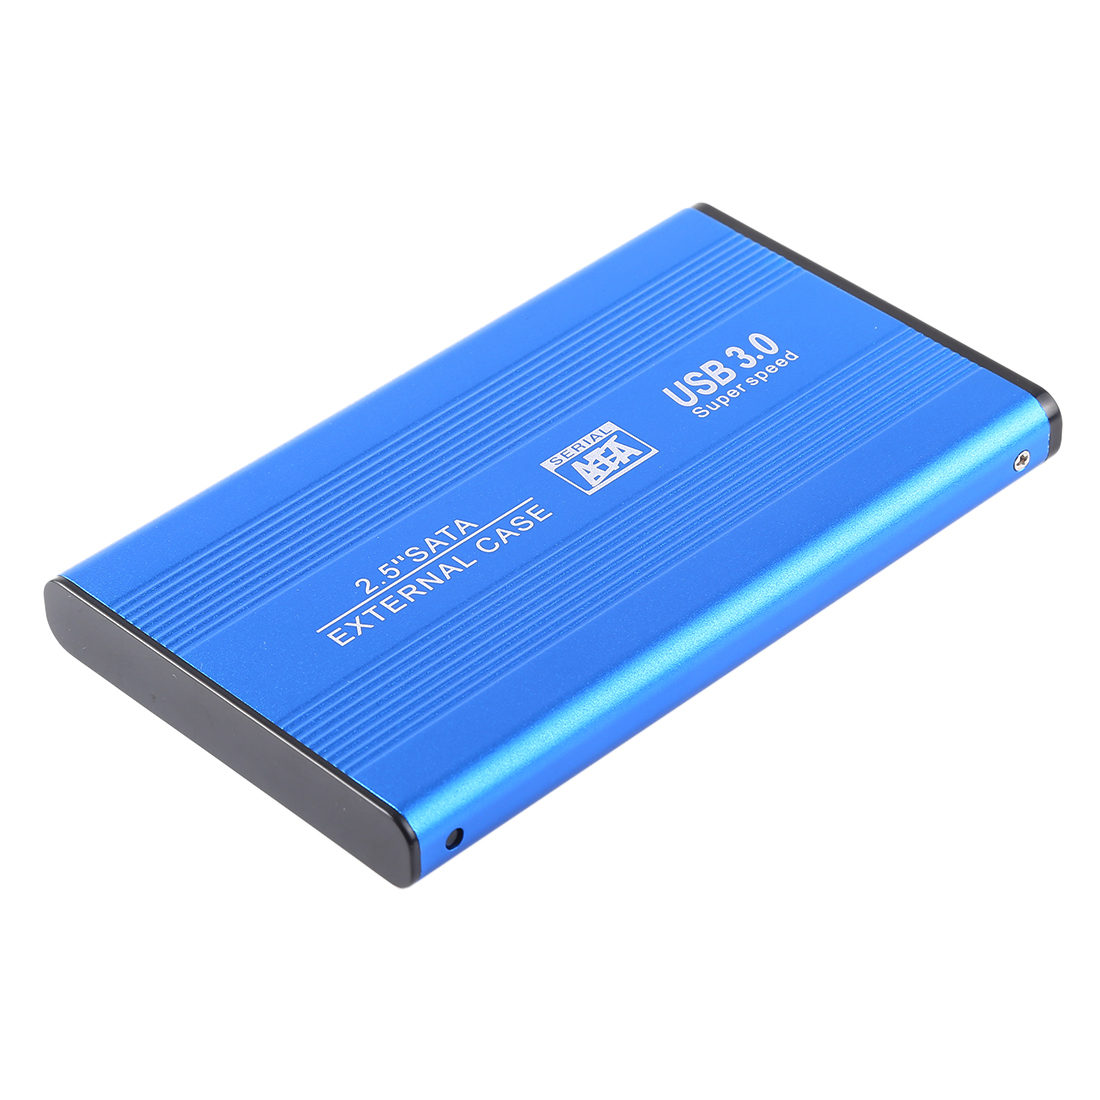 Richwell SATA R2-SATA-250GB 250GB 2.5 inch USB3.0 Super ...